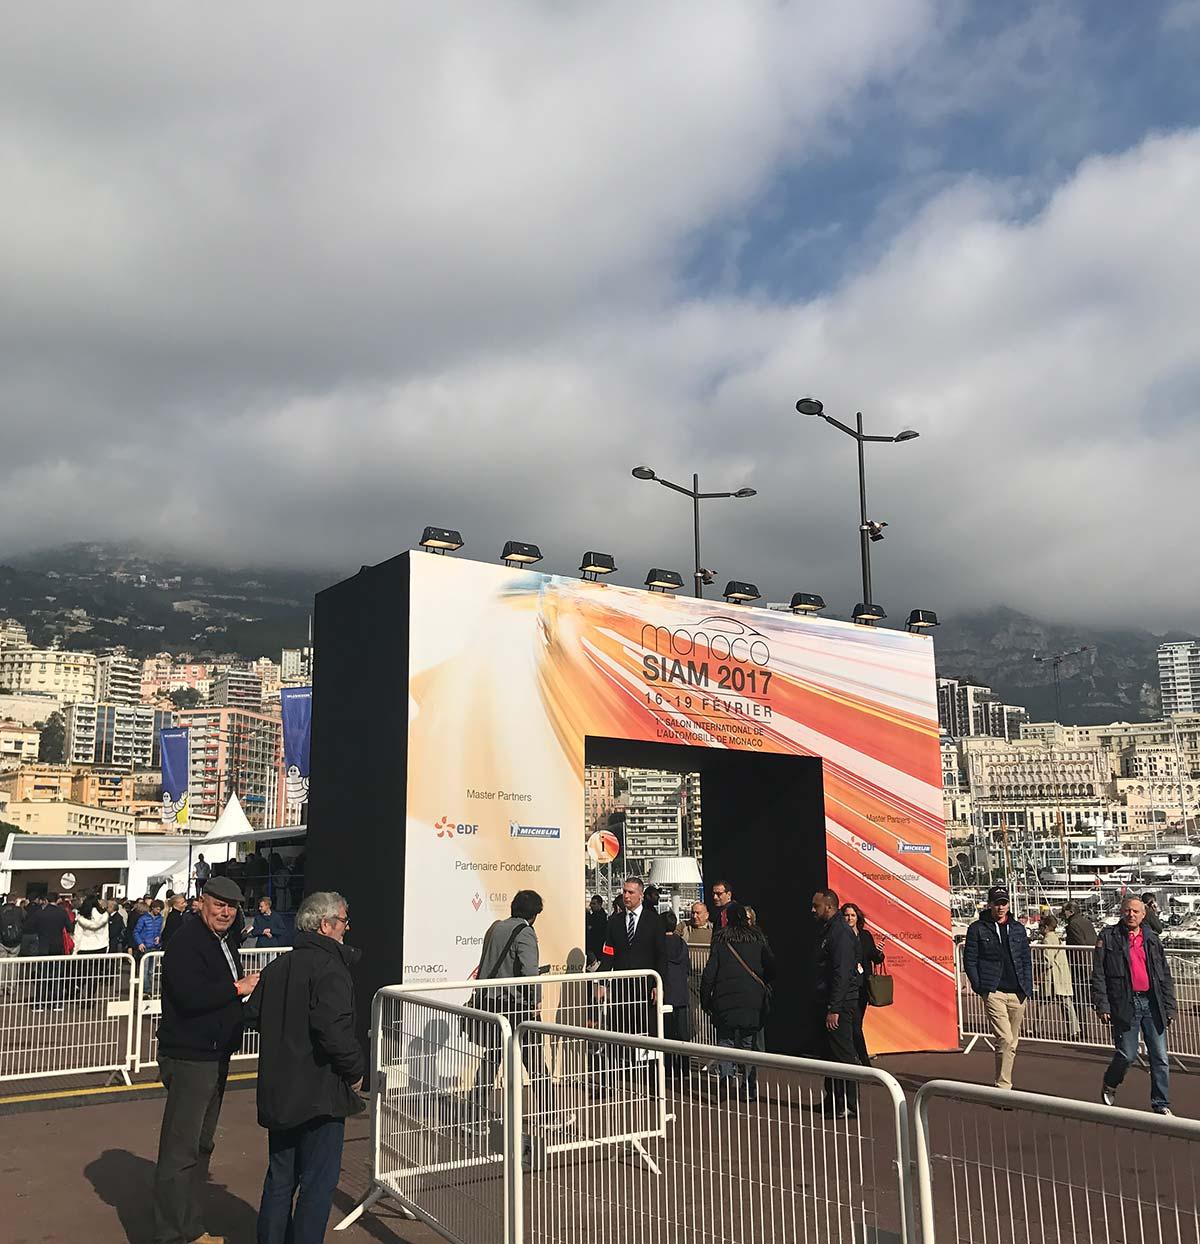 Monaco International Motor Show 2017 - SIAM 2017